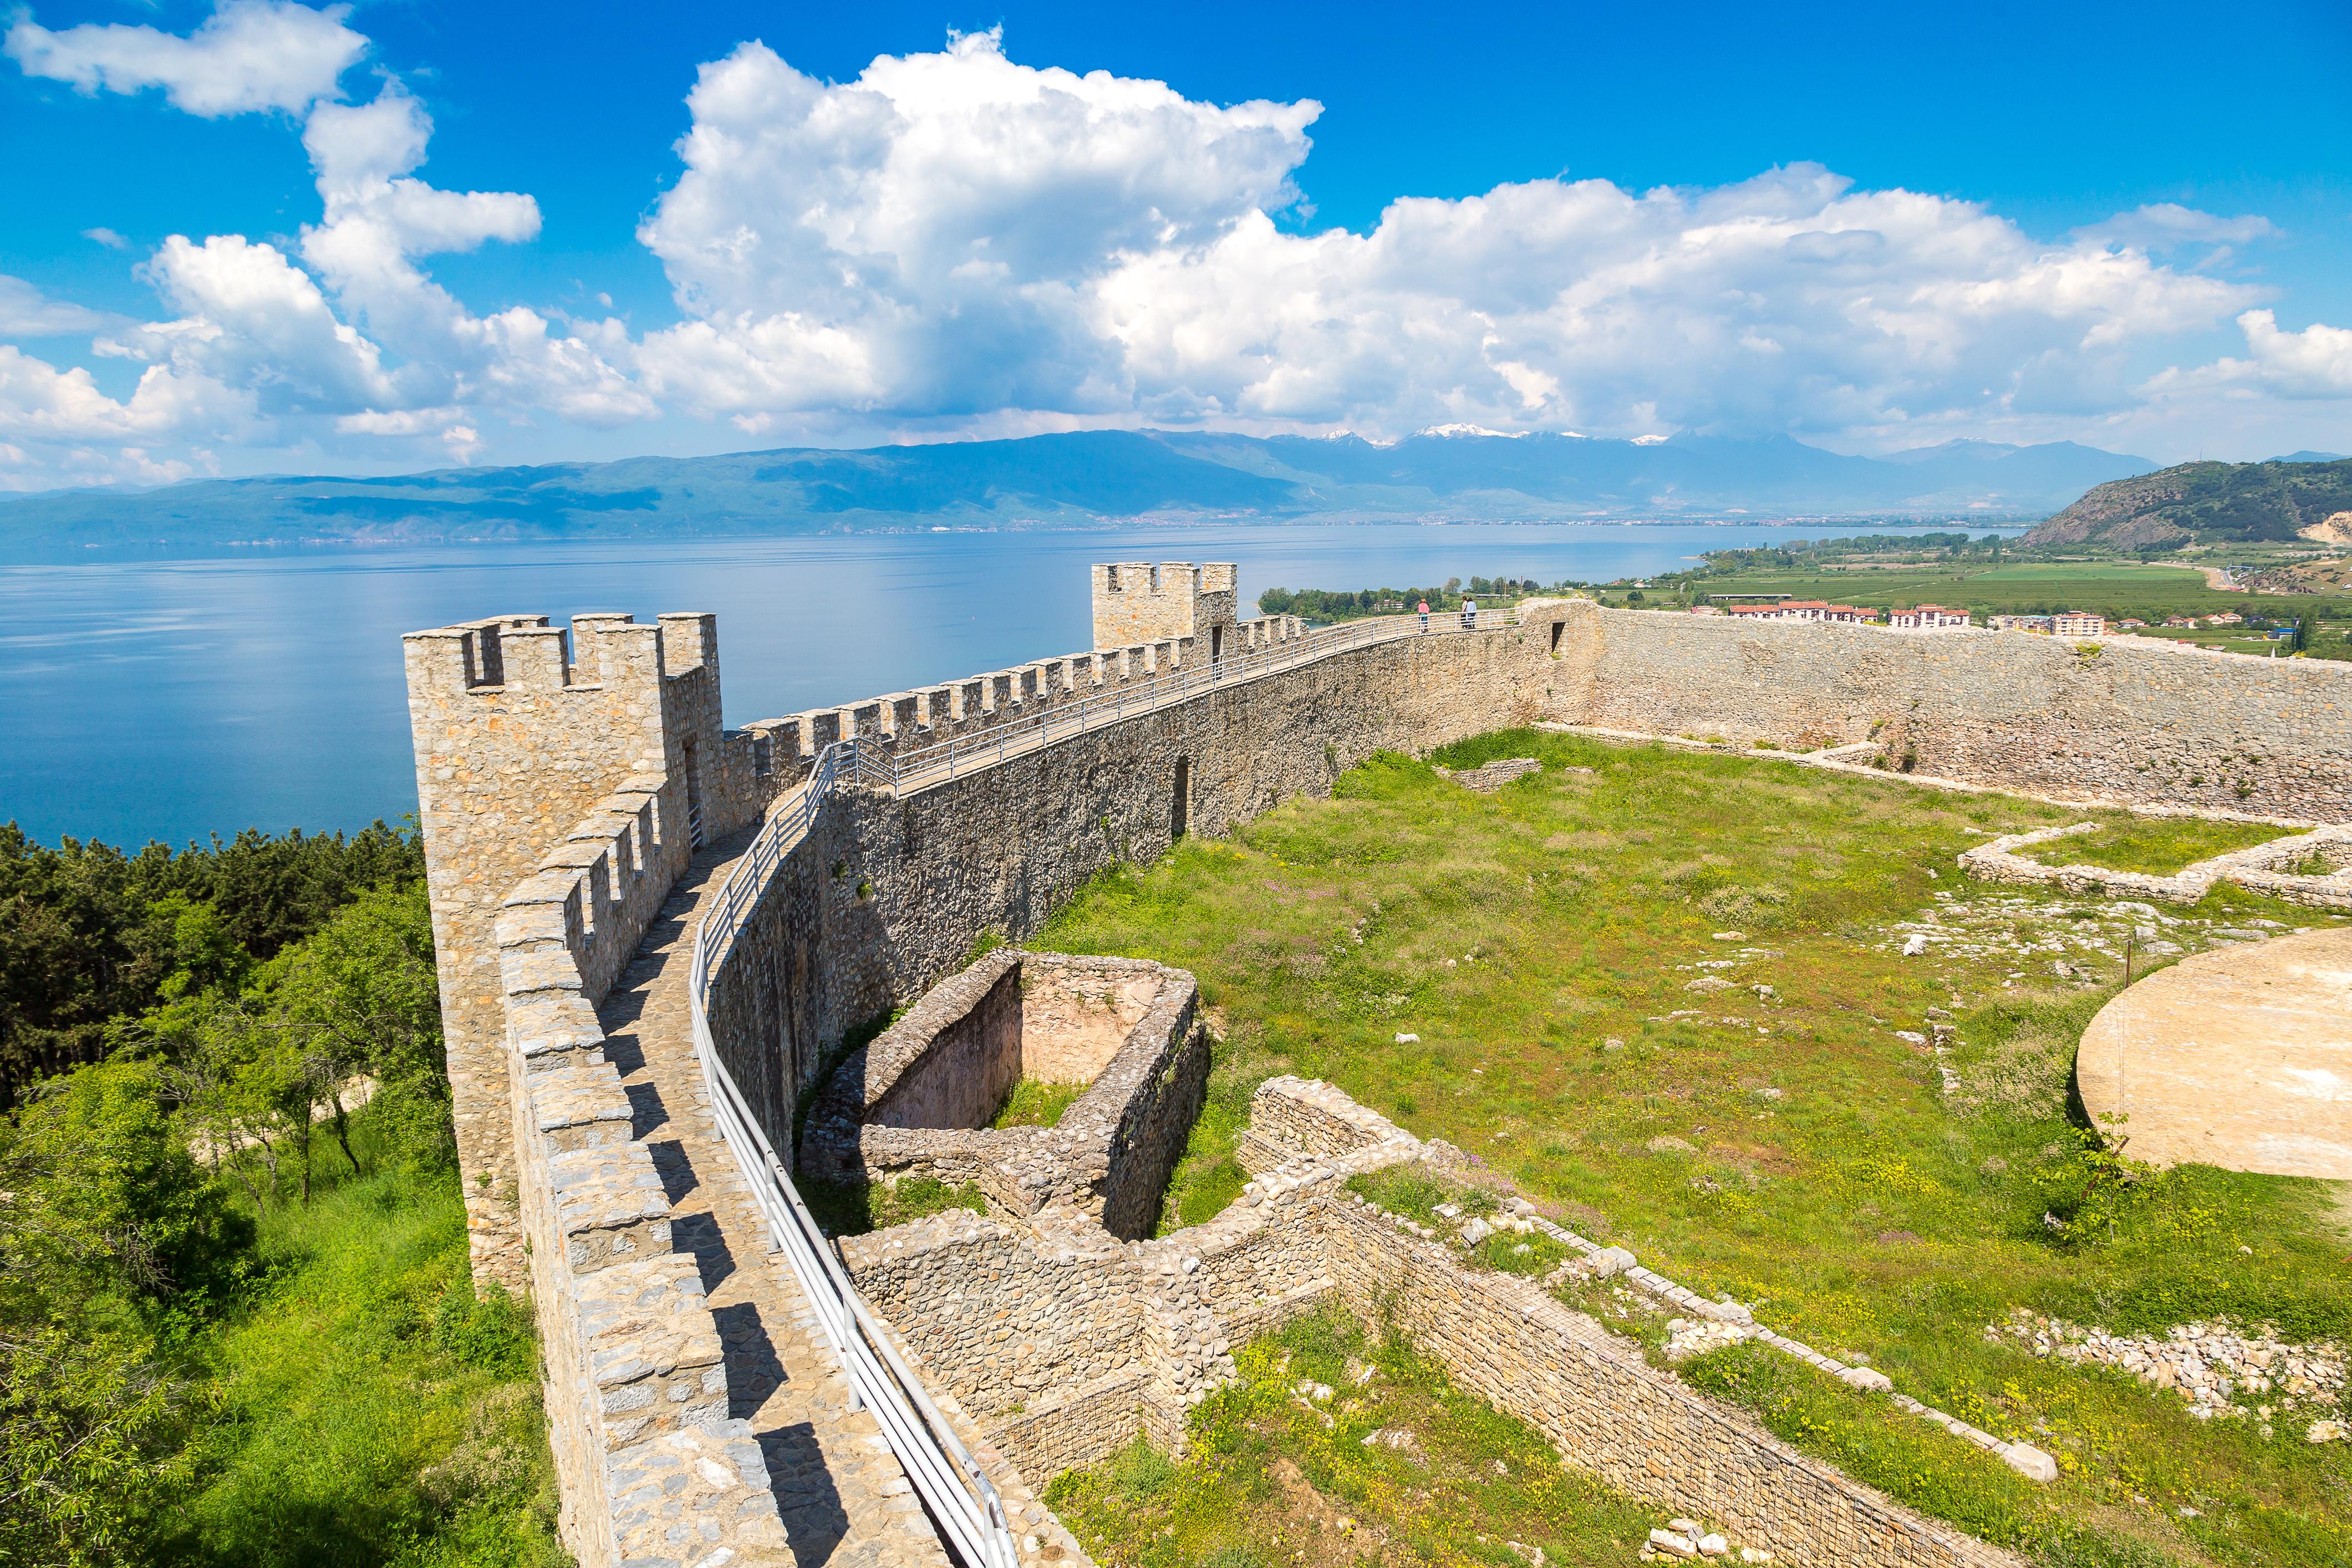 Екскурзия през март или май до Охрид и Скопие, с посещение на каньона Матка - 2 нощувки, транспорт и екскурзовод! - Снимка 3